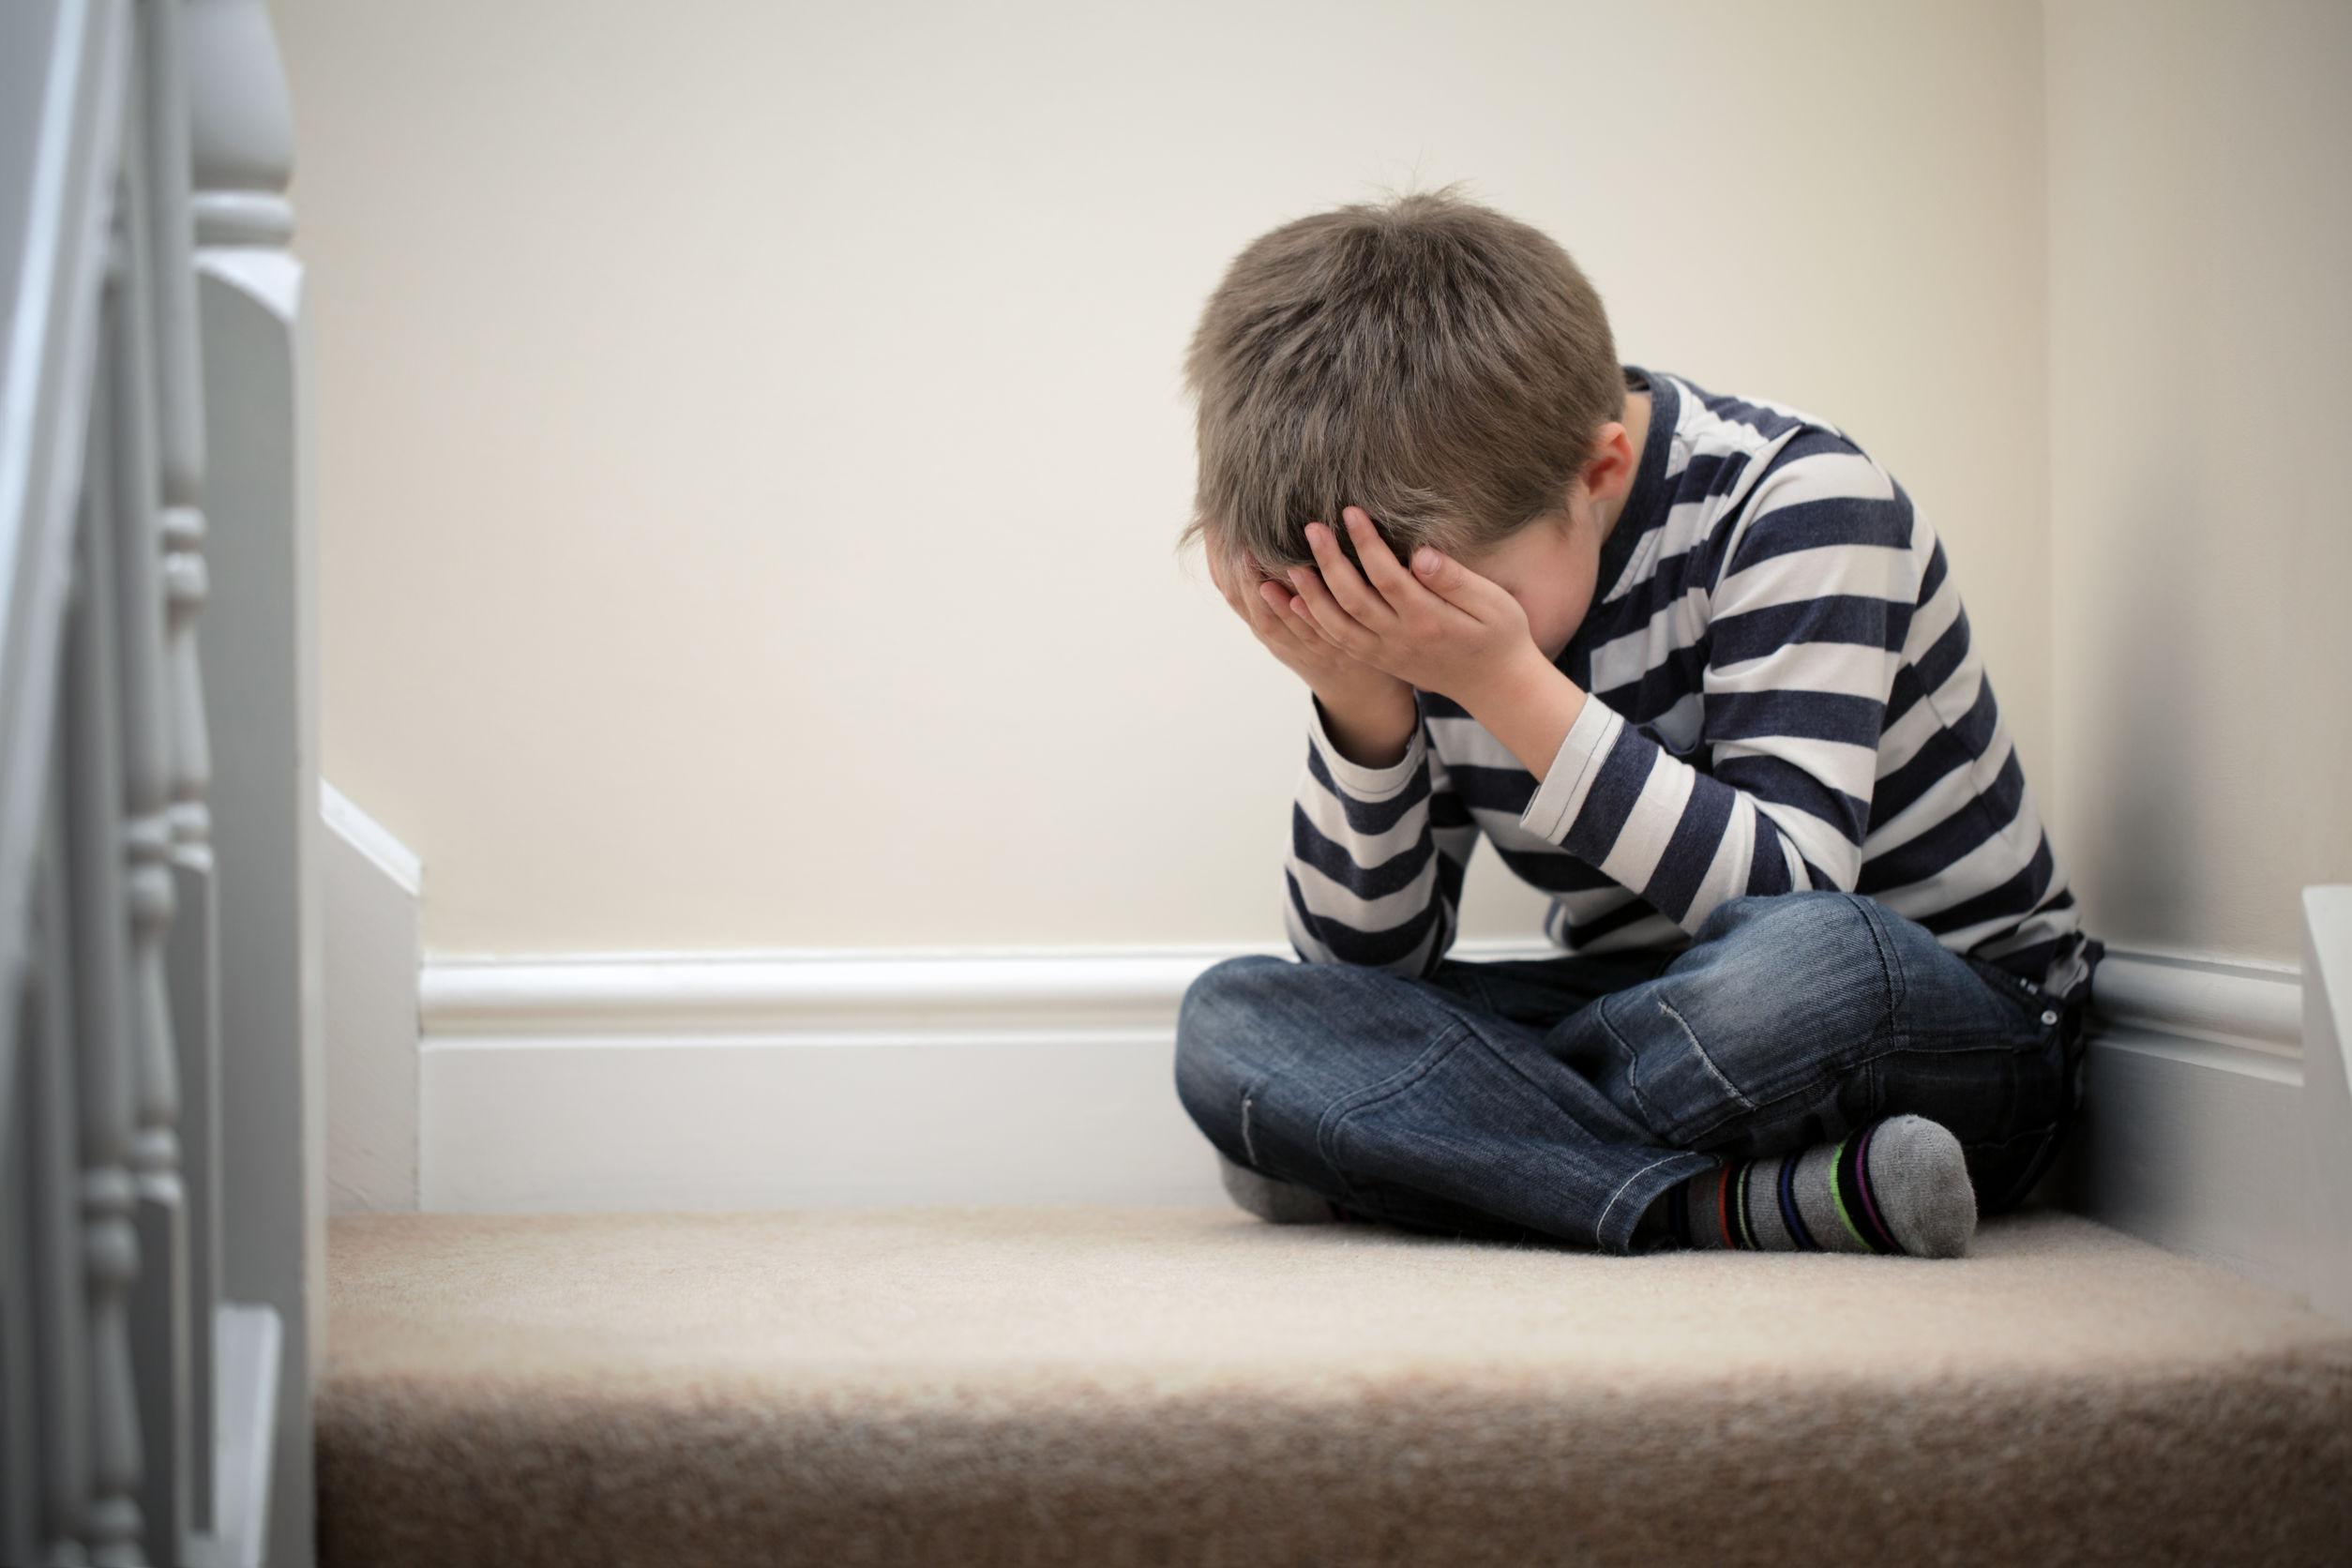 Warning Signs of Child Sexual Exploitation (CSE)